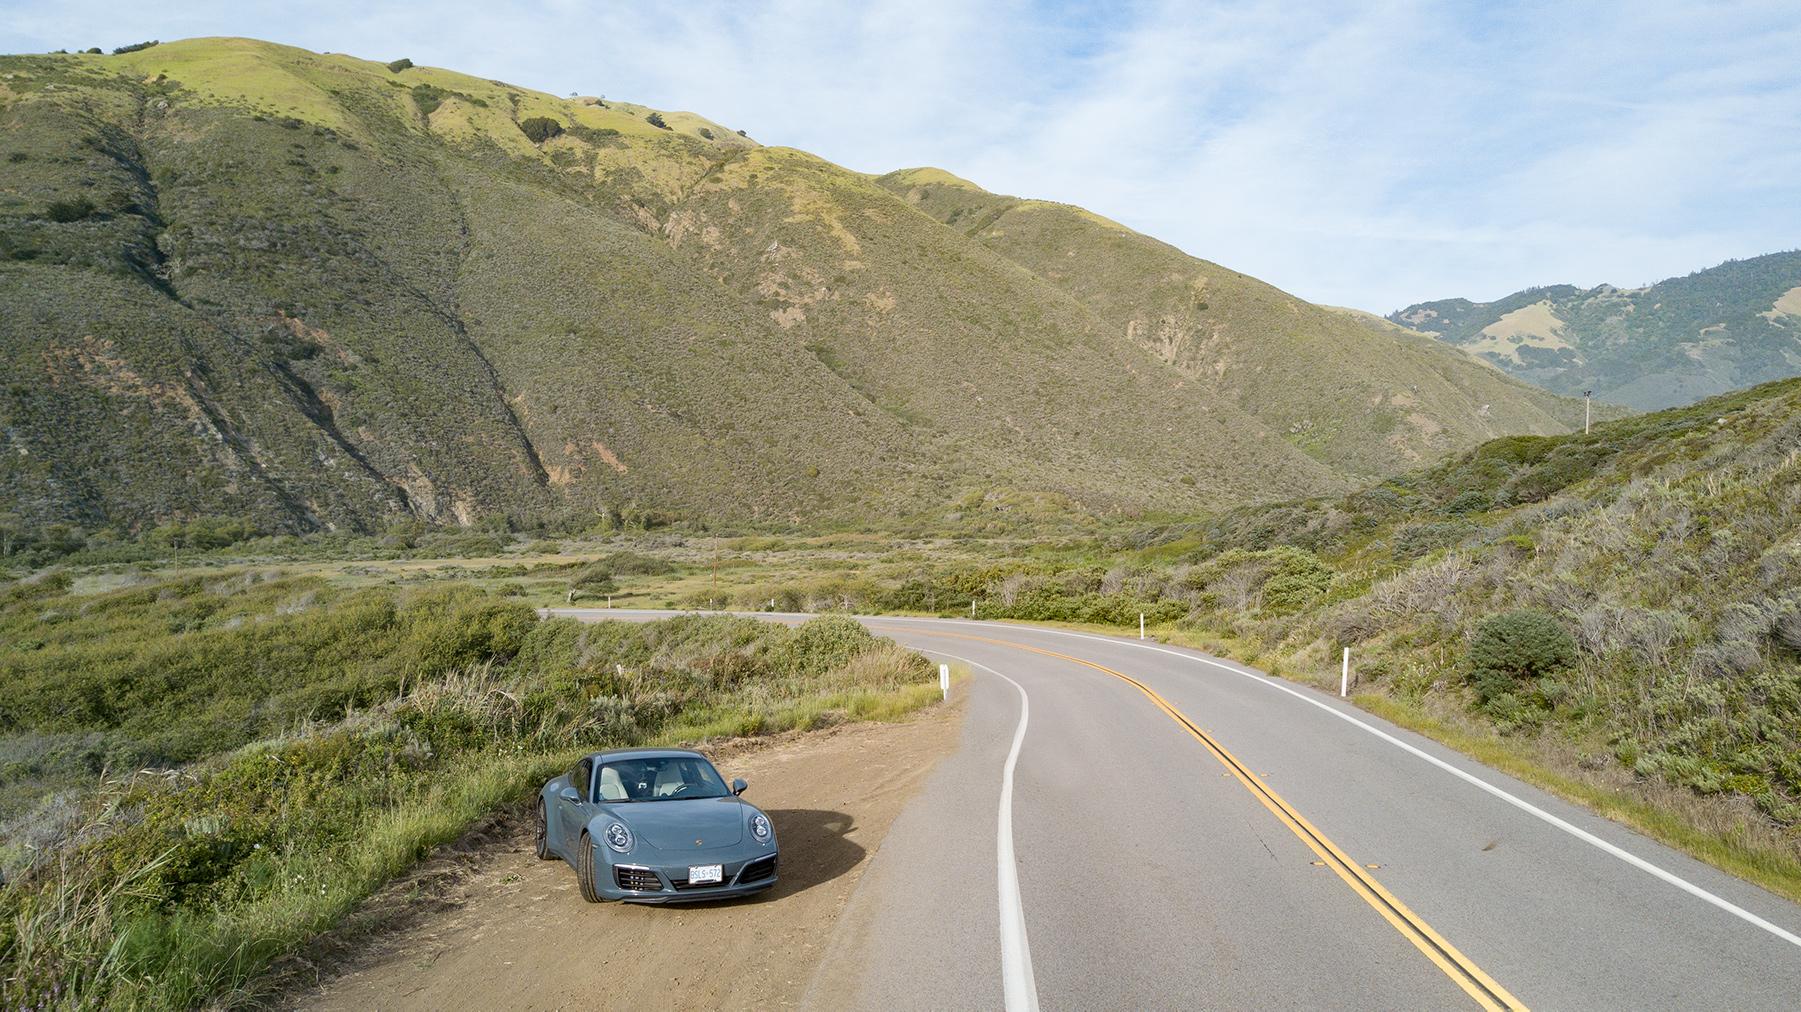 TrackWorthy - Toronto to LA in a Porsche 911 C4S - Map 1